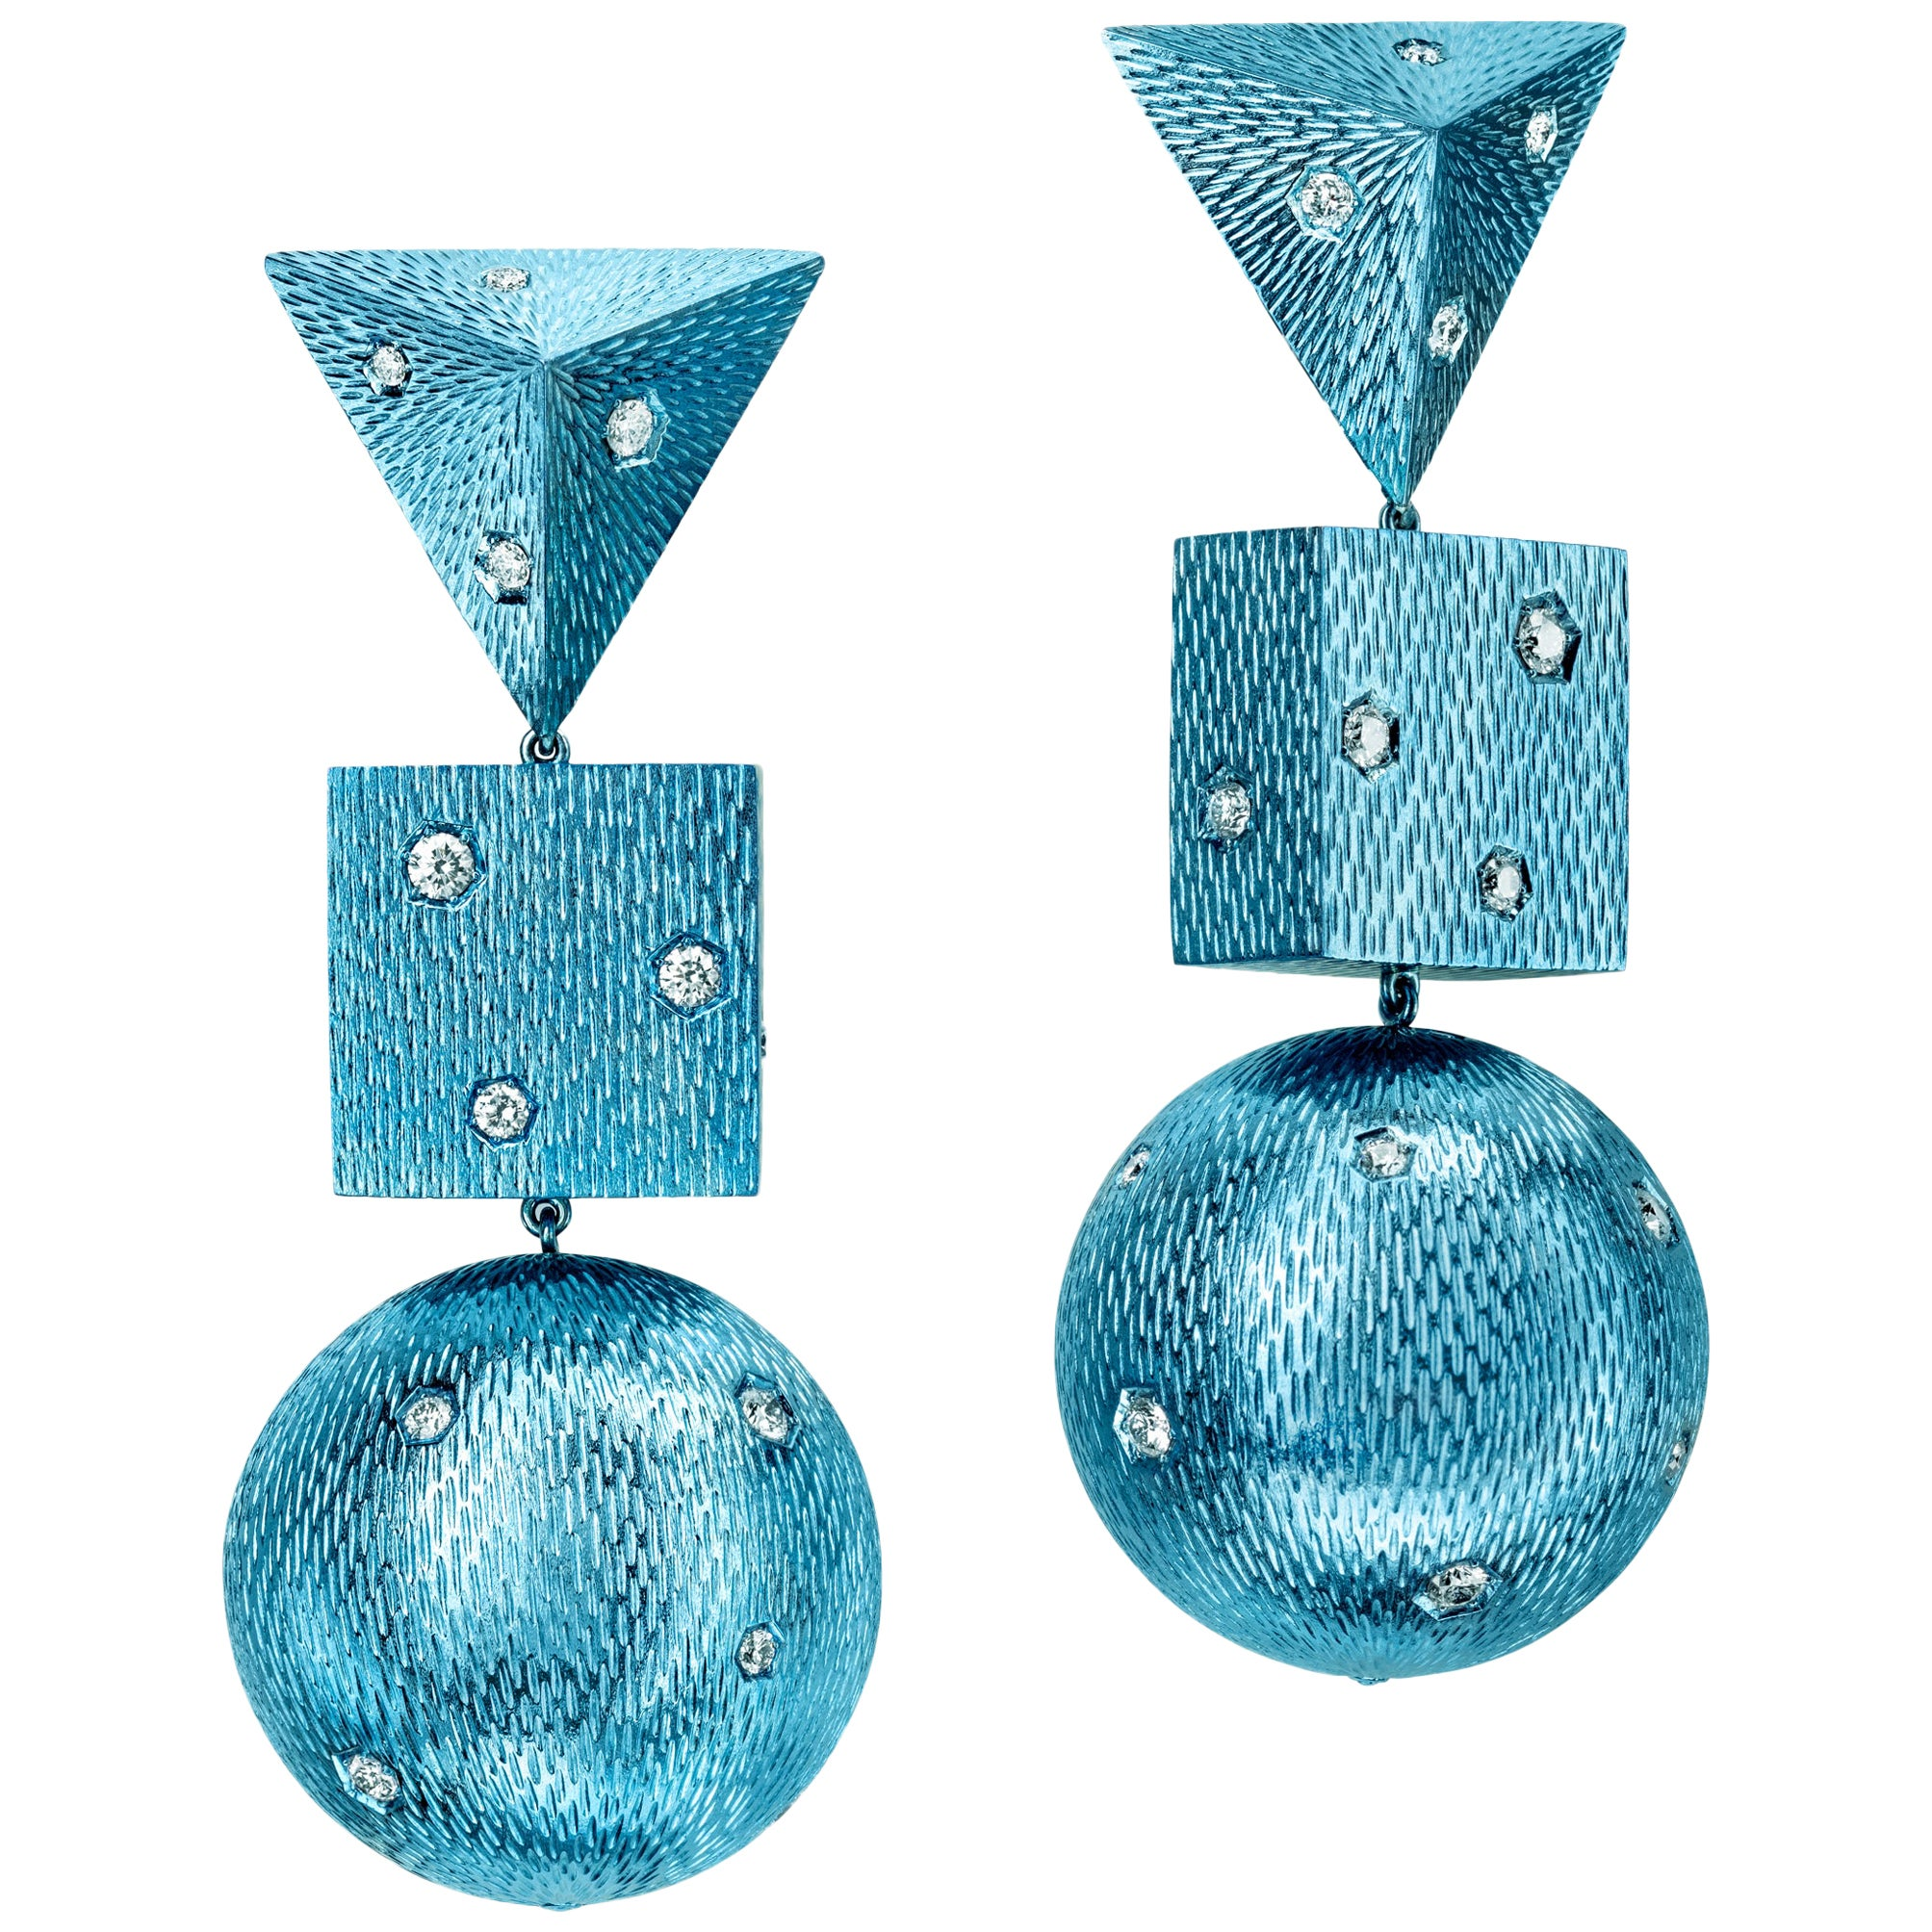 Sabbadini Contemporary Titanium, Gold and Diamond Earrings